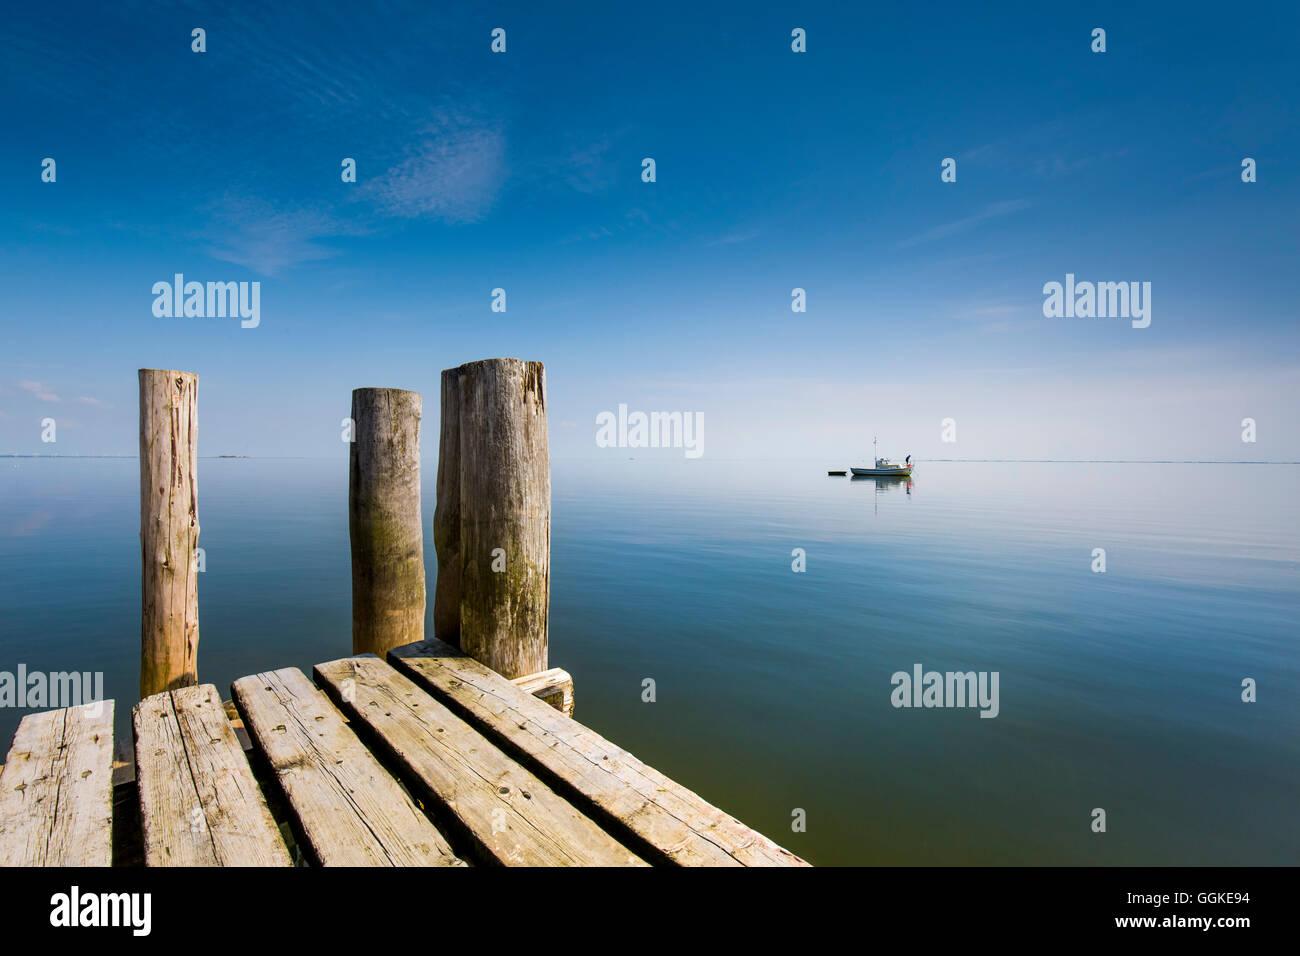 Barco en aguas tranquilas, Hallig Langeness, Islas de Frisia septentrional, Schleswig-Holstein, Alemania Foto de stock